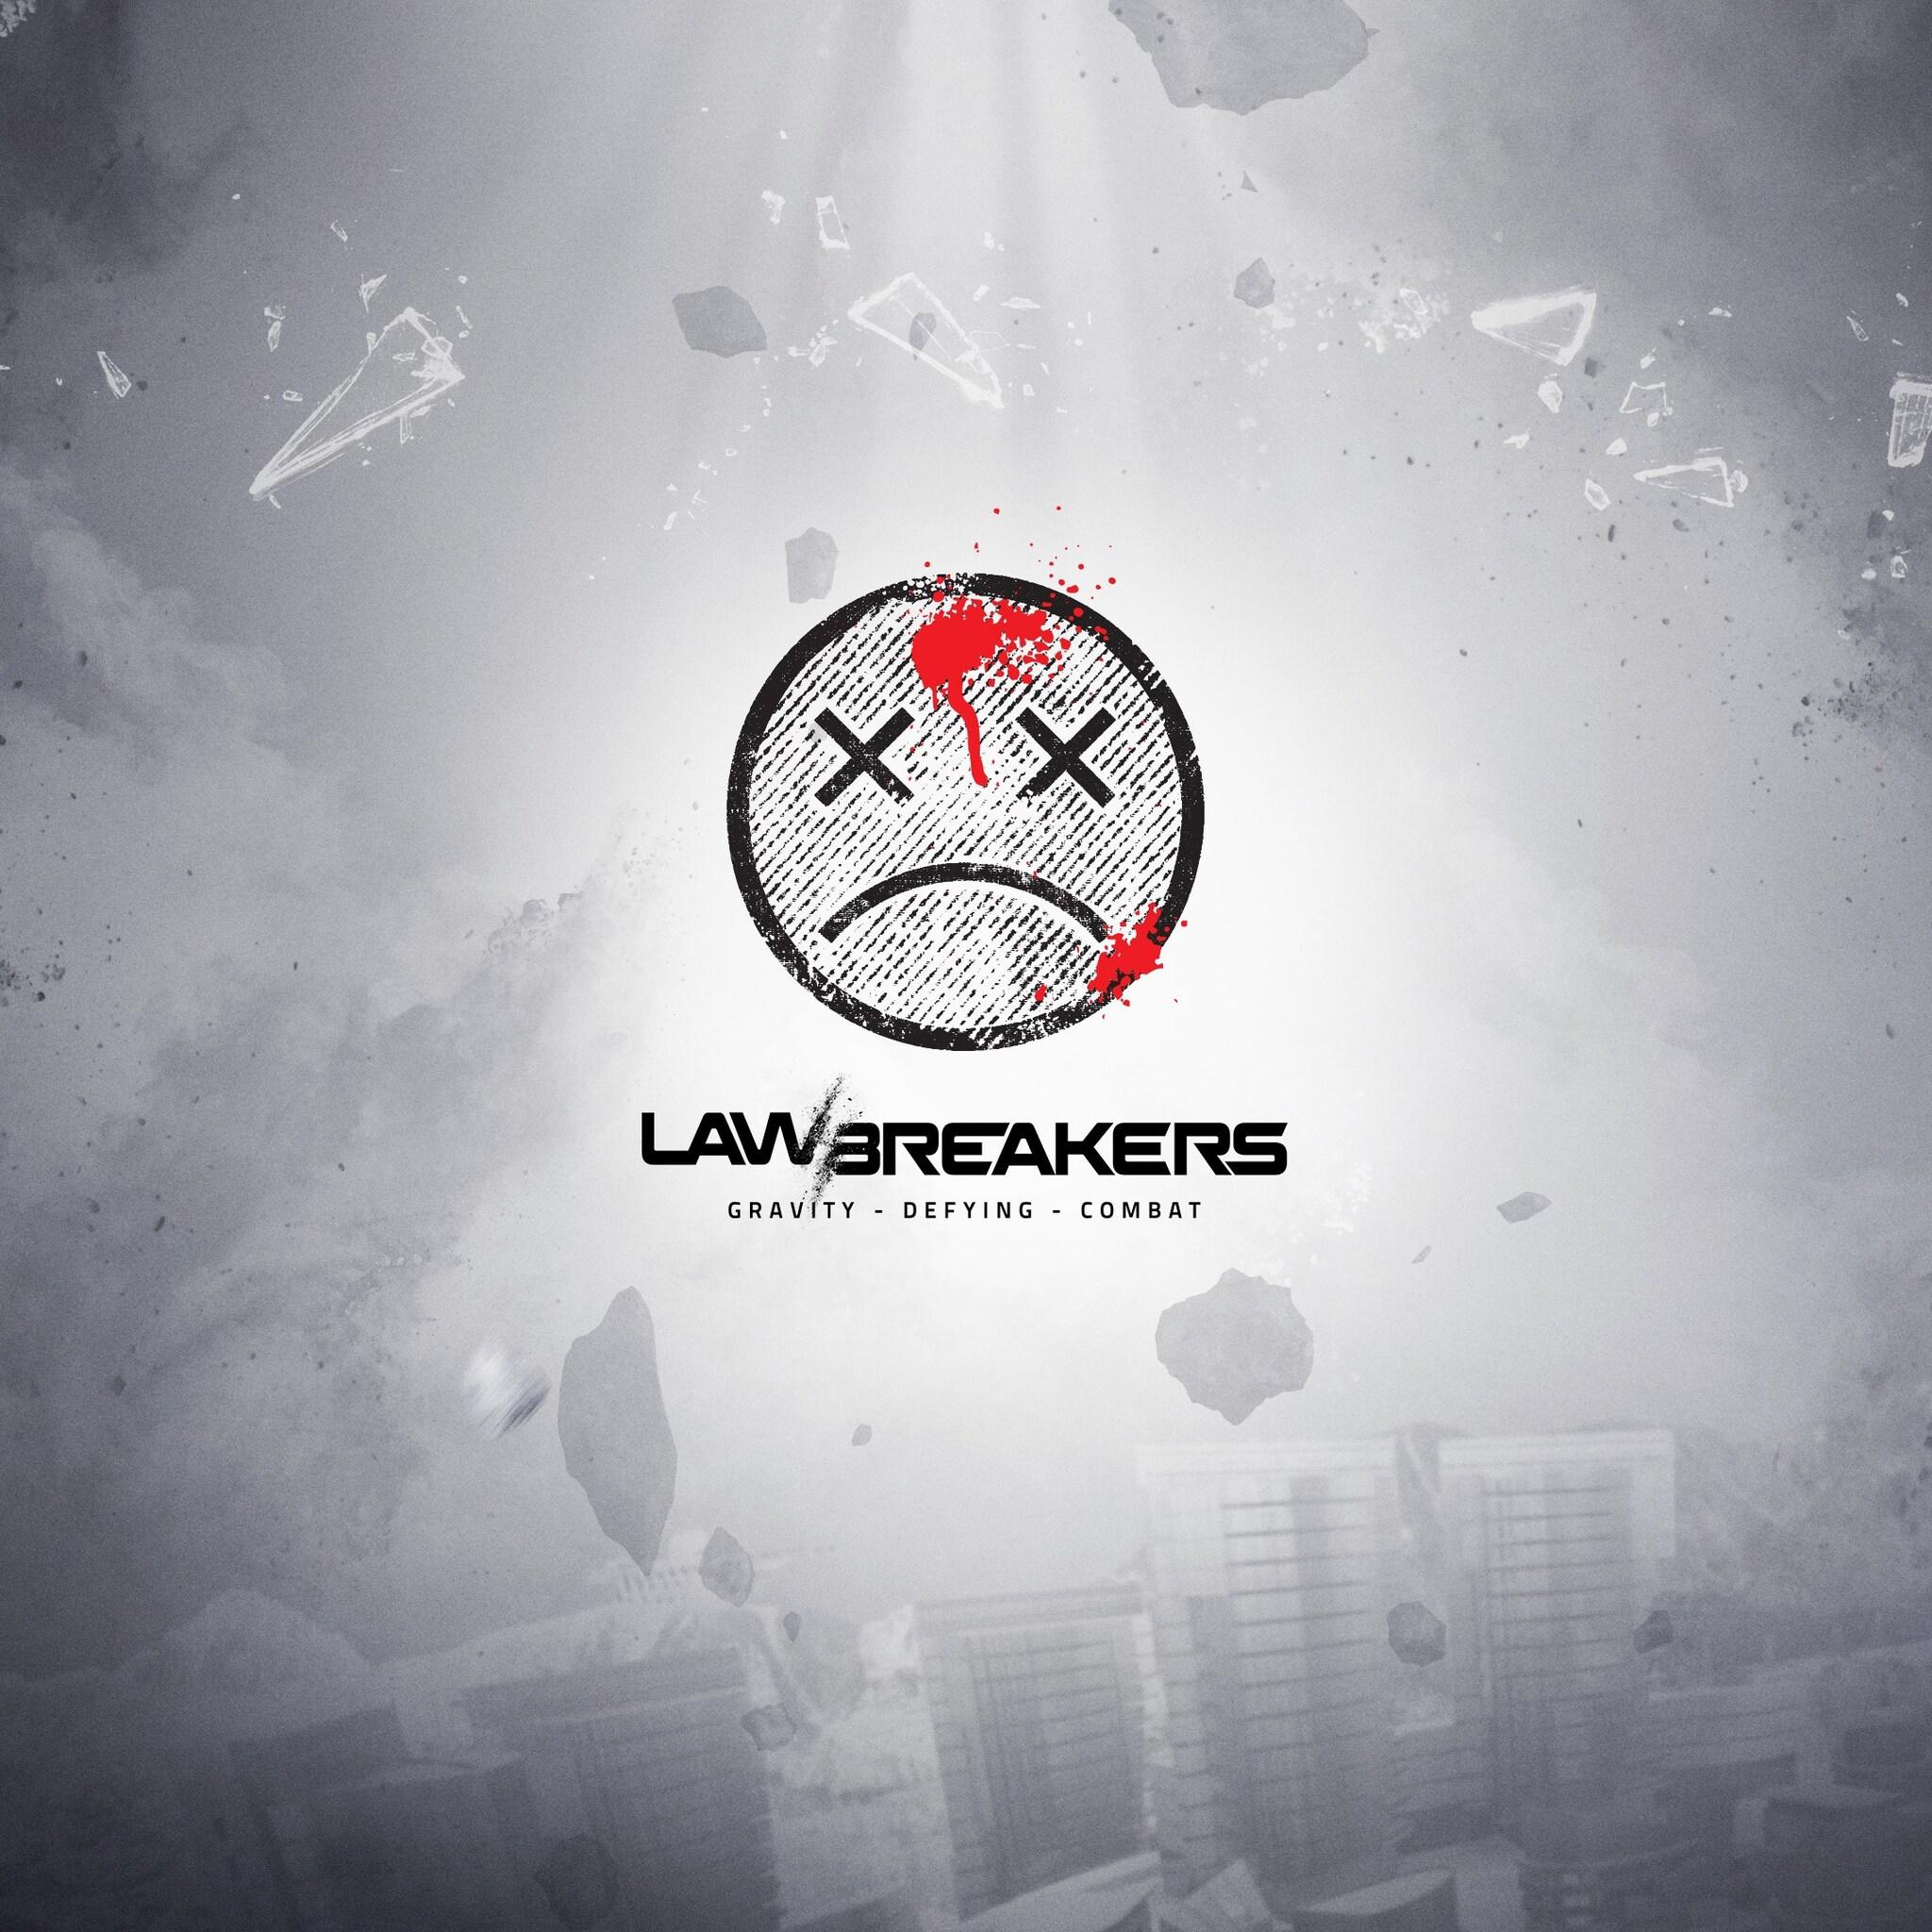 lawbreakers-4k-logo-3d.jpg